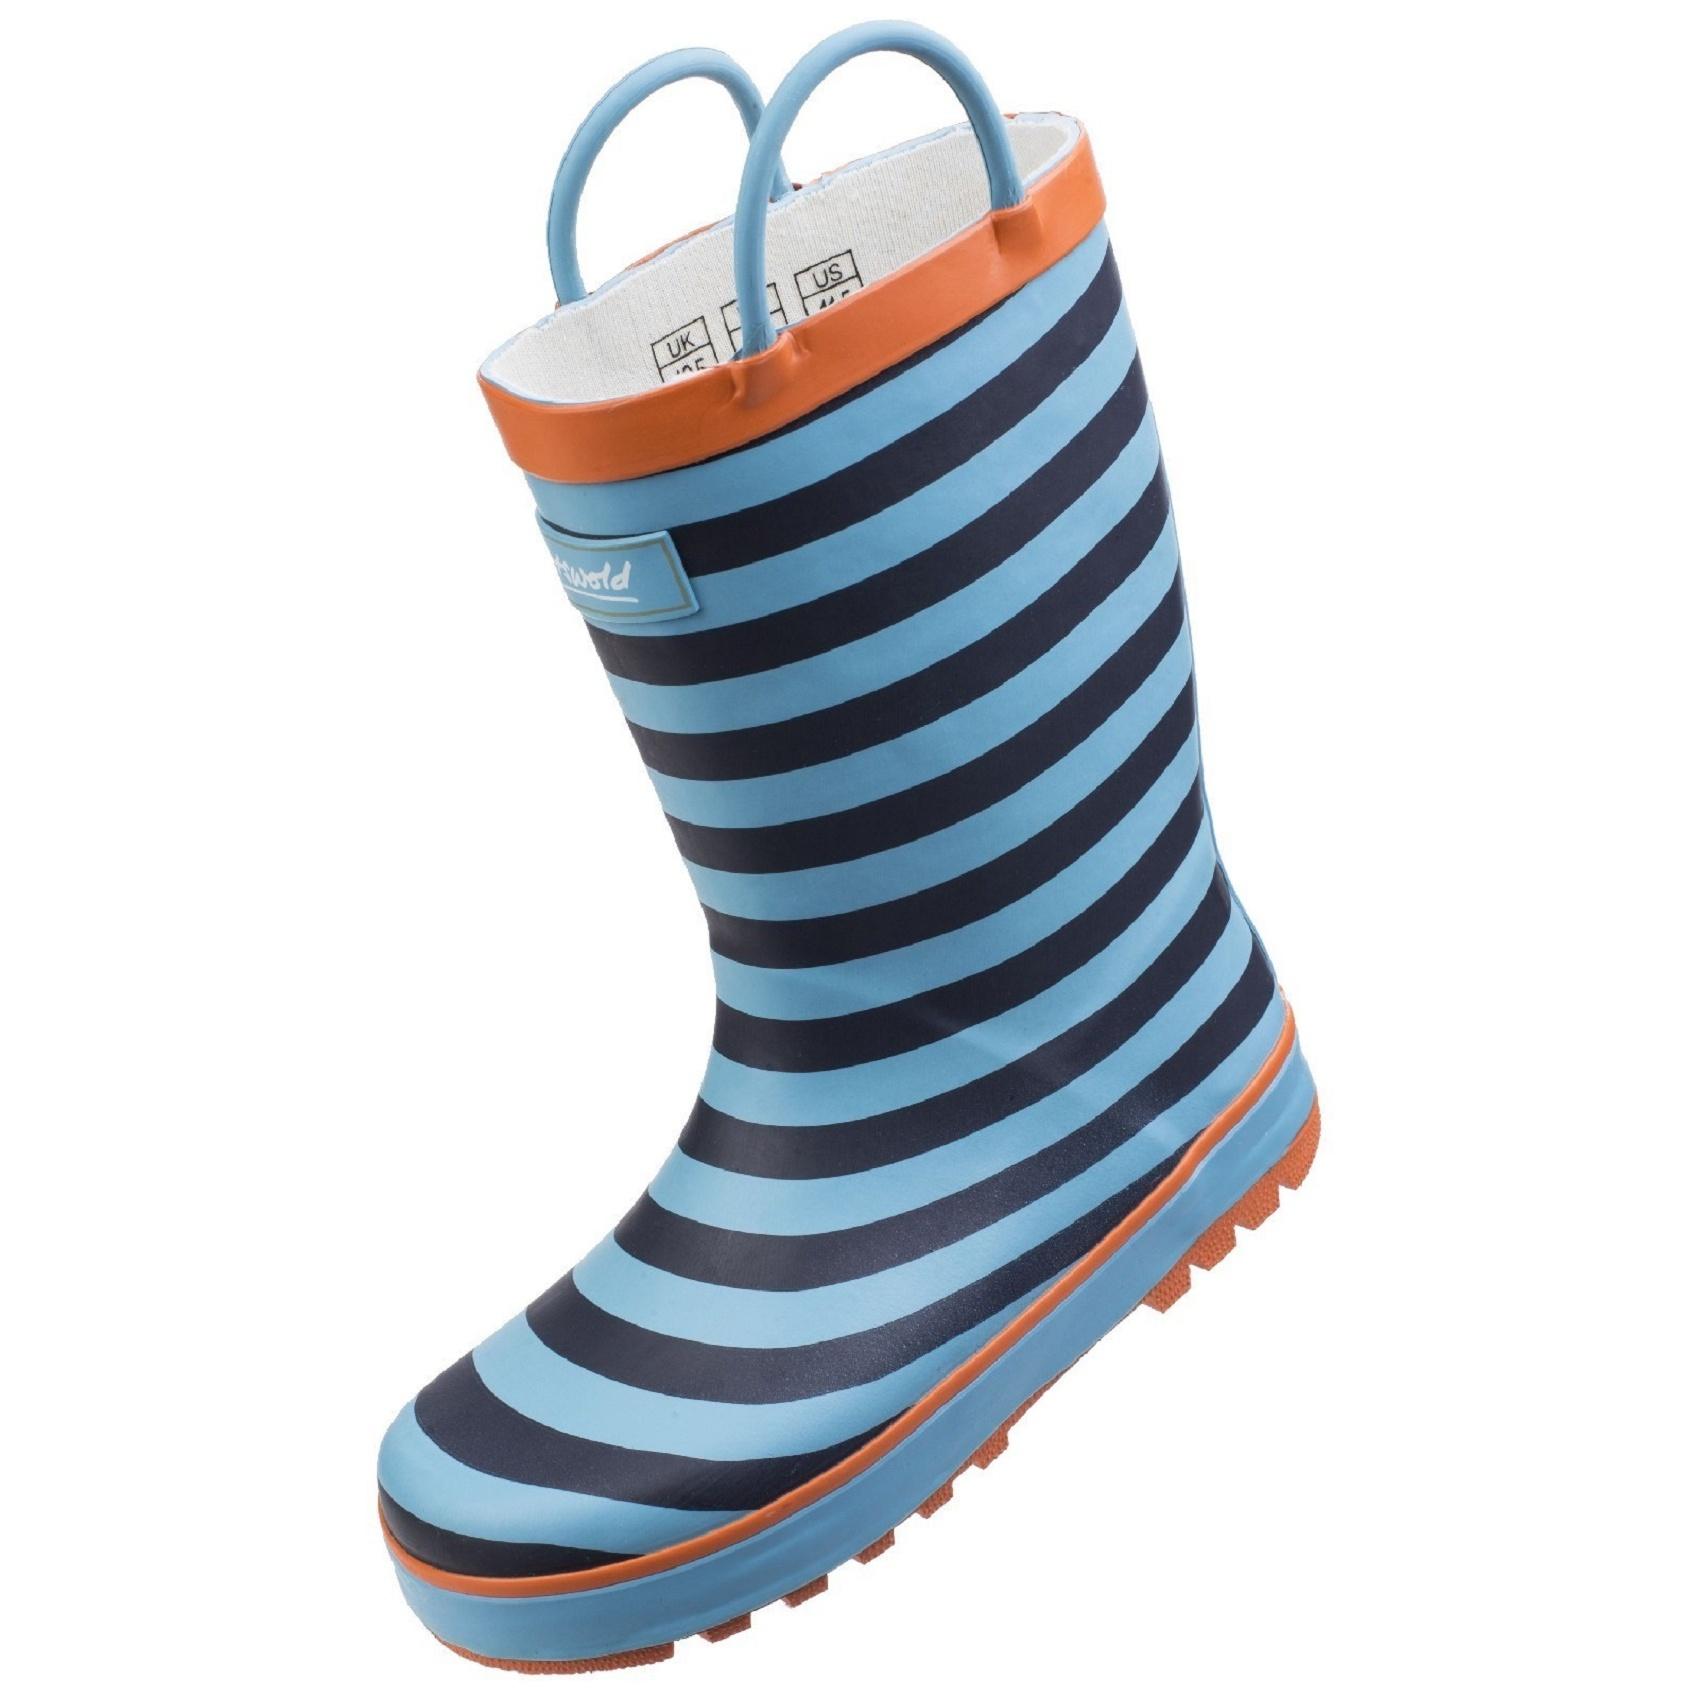 Cotswold Childrens//Kids Captain Striped Wellington Boots